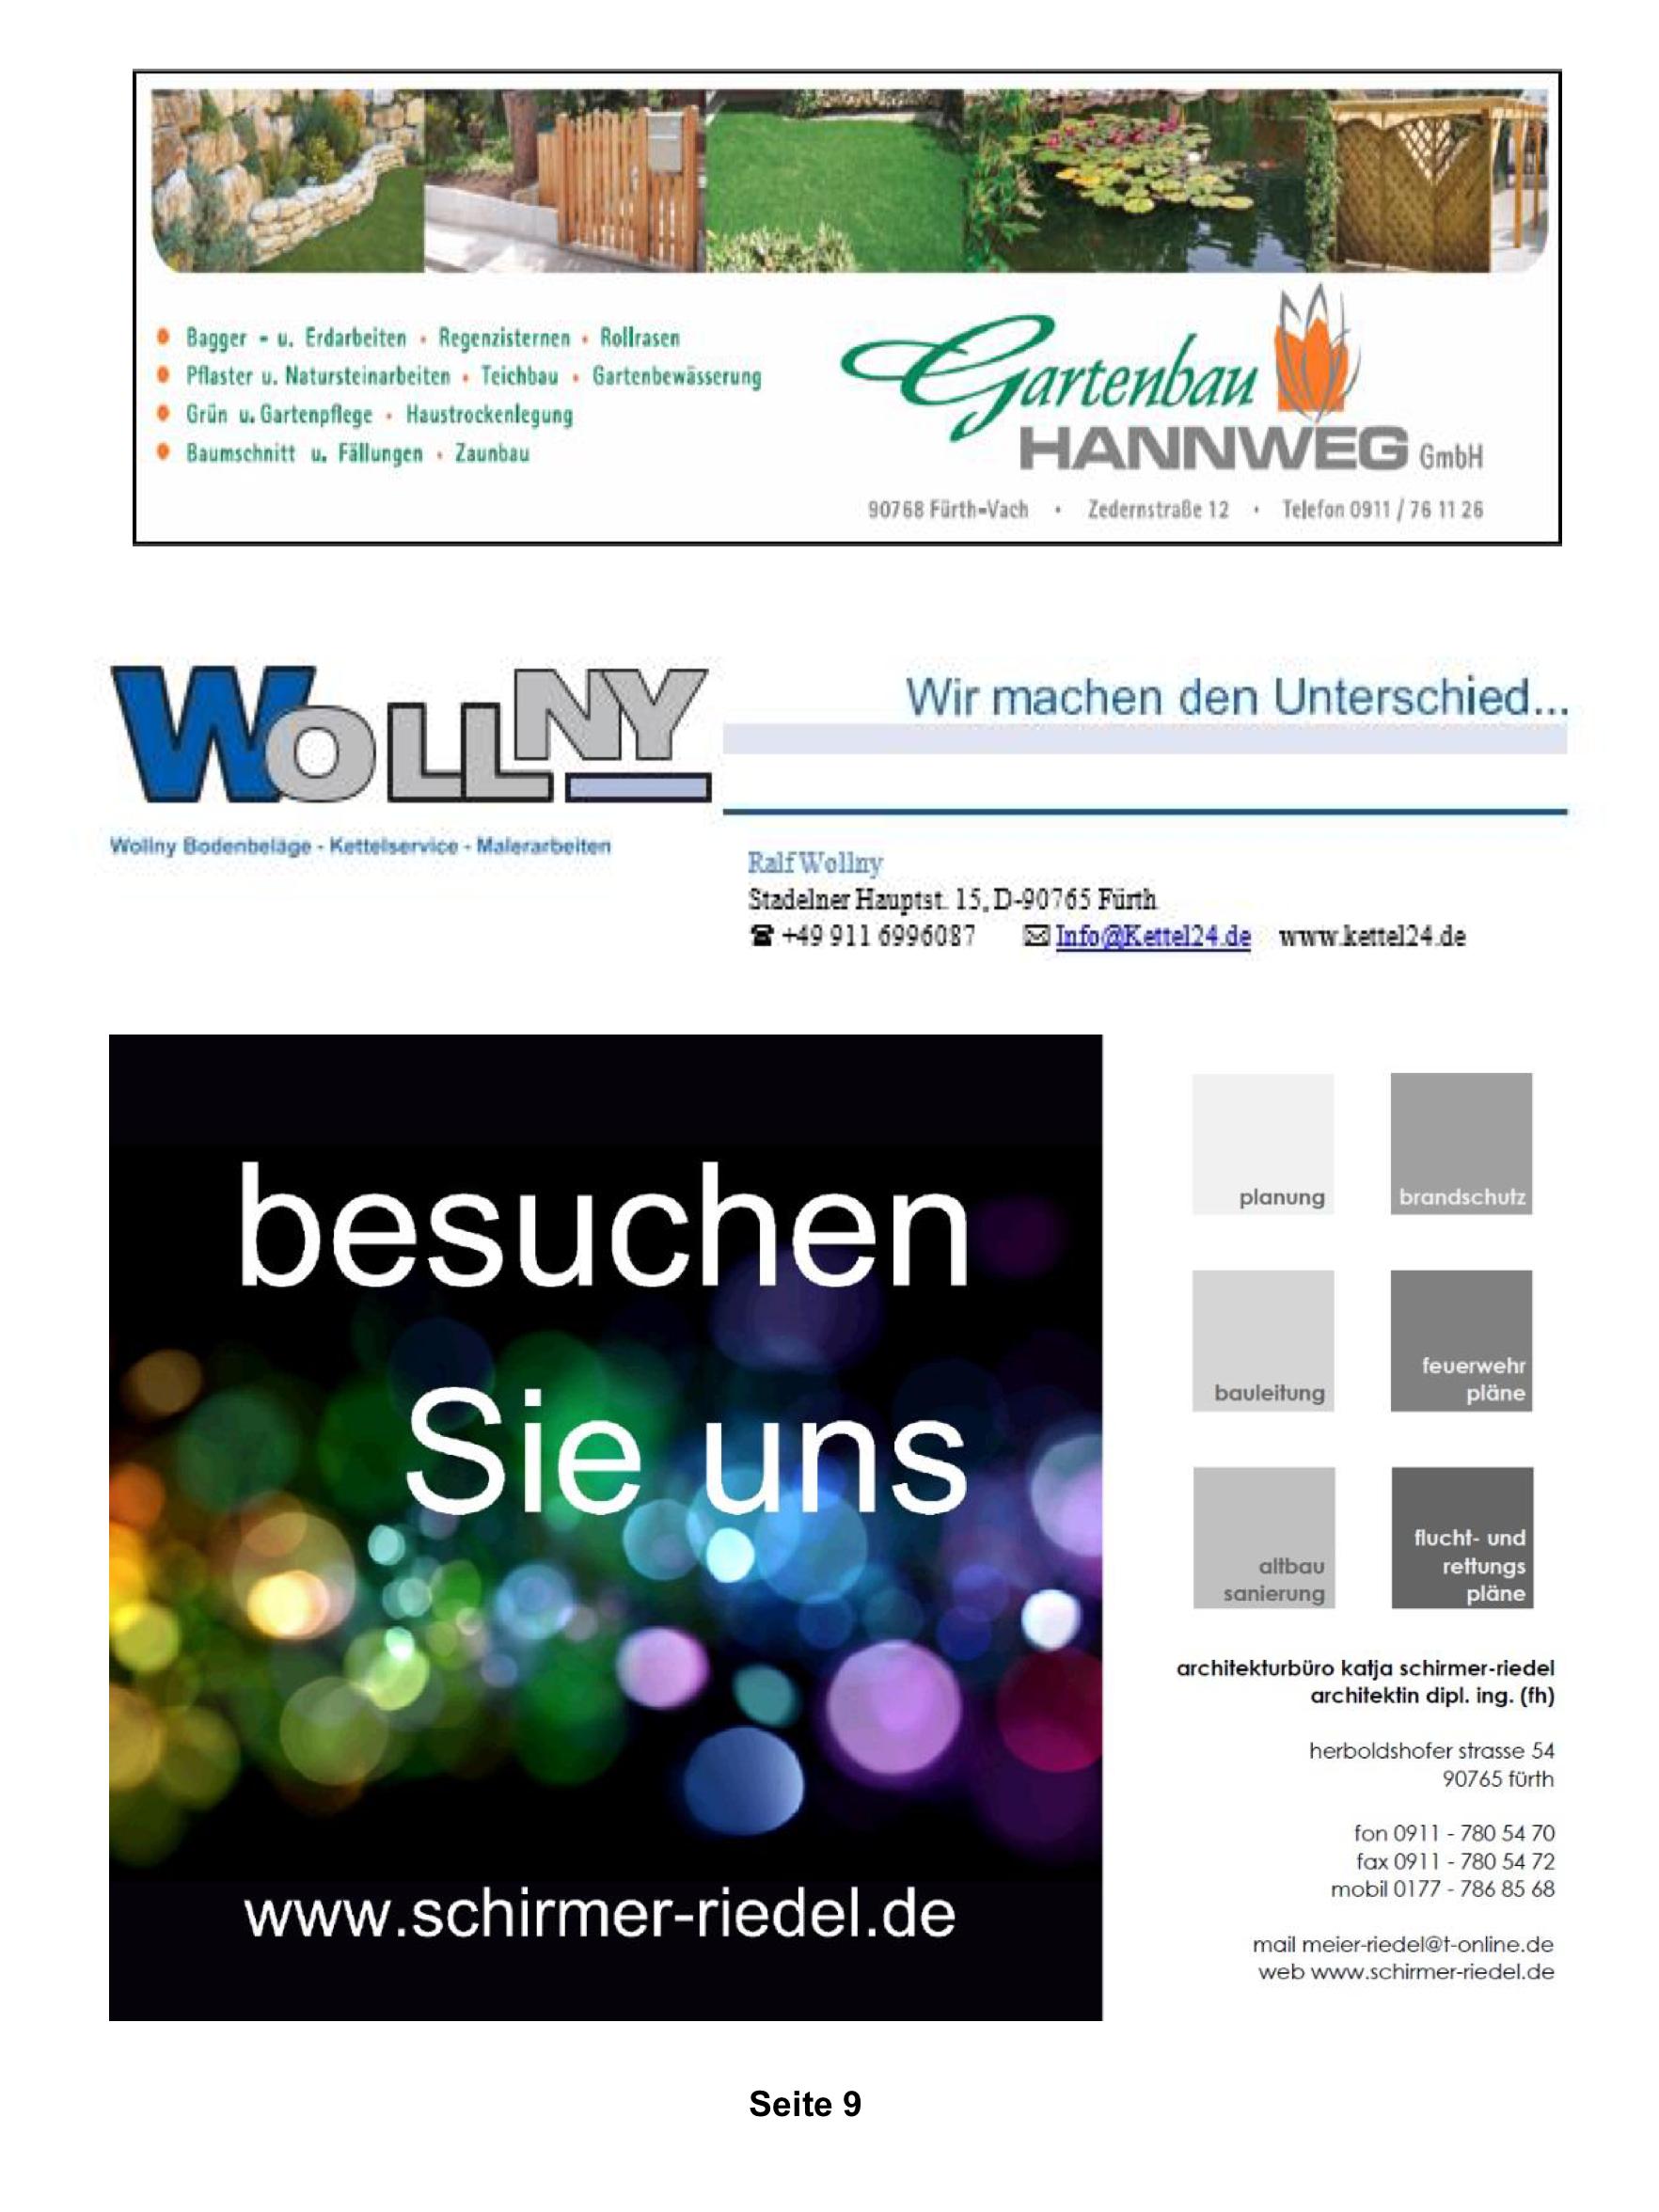 Weisendorf-9.png